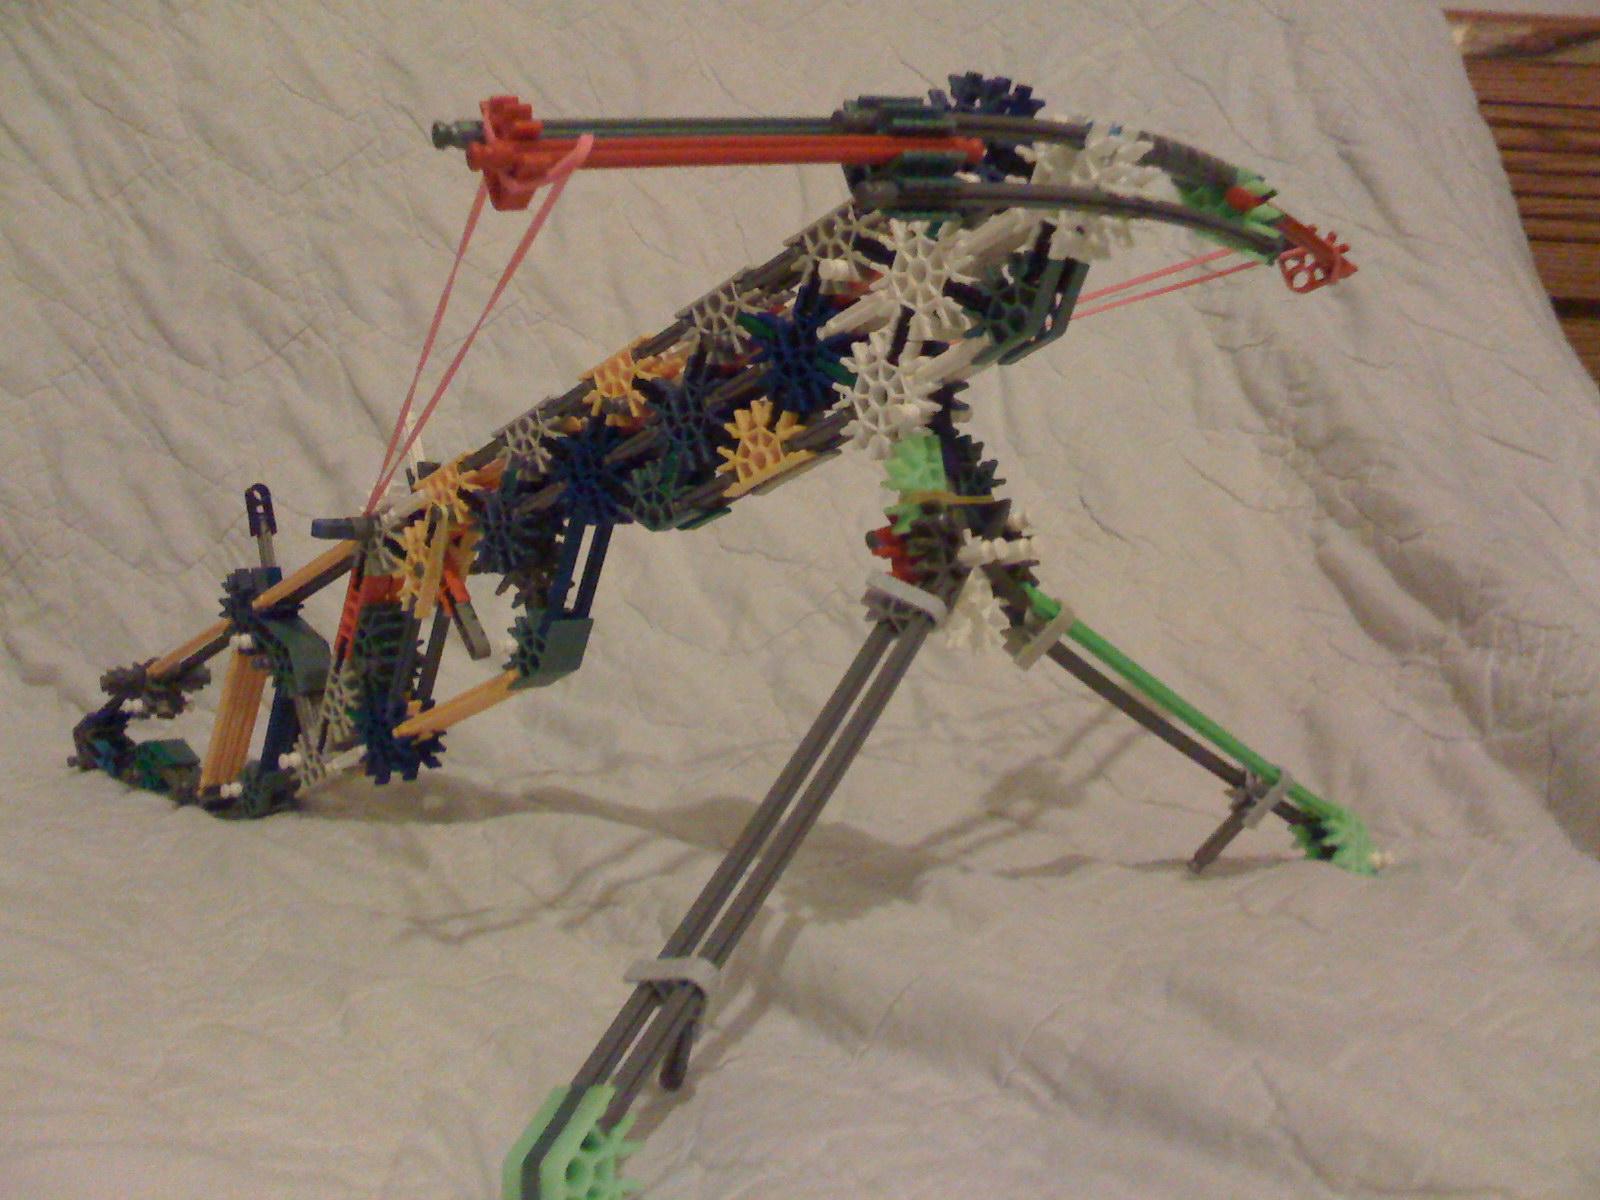 Knex Longbow SR-L crossbow